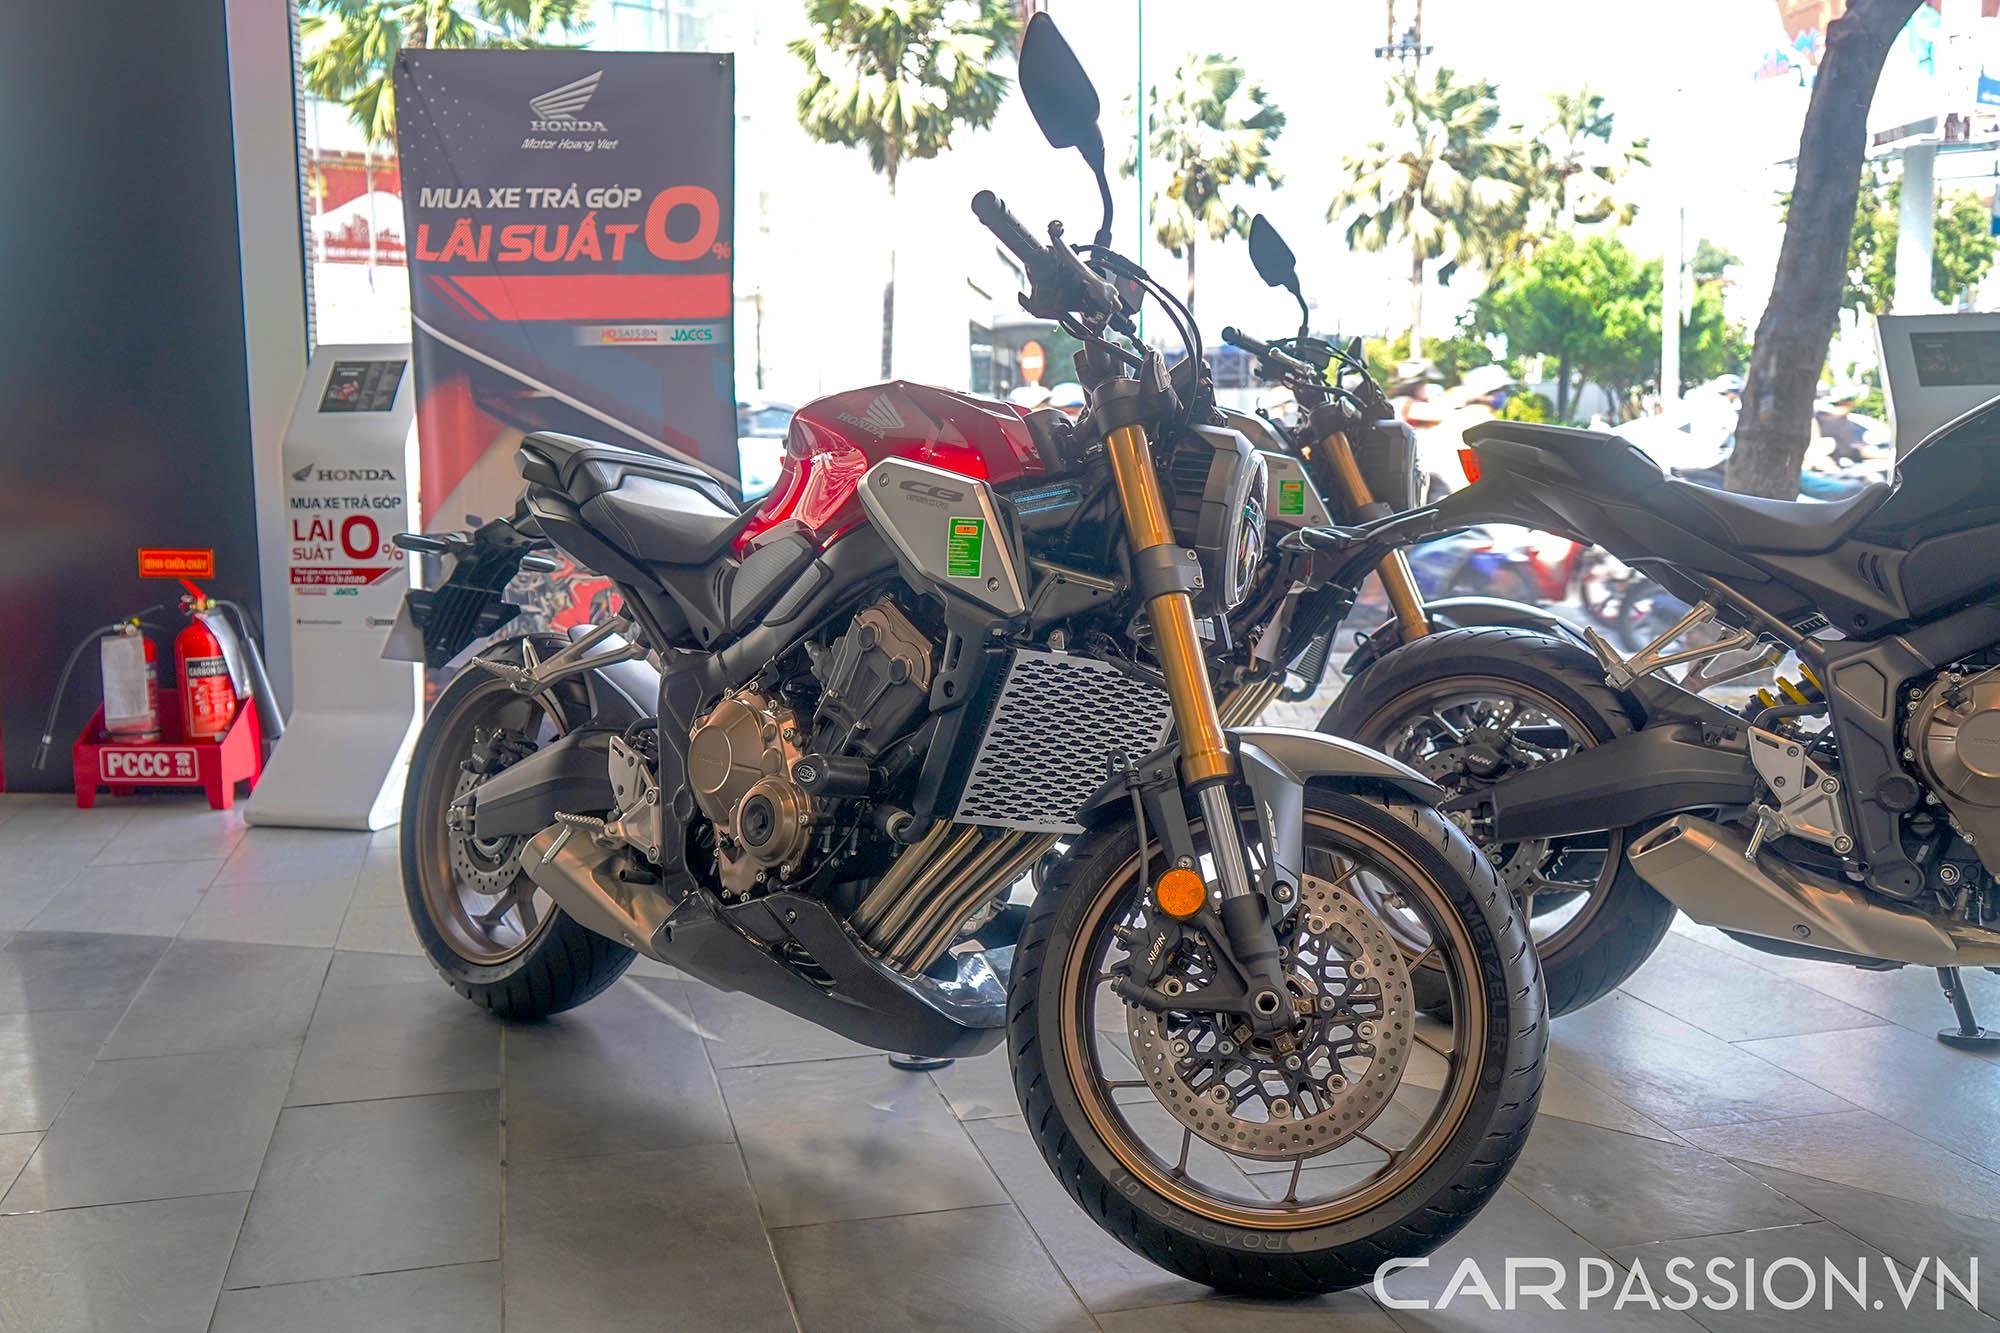 honda-cb650r-2021-canh-tranh-pkl-650cc-anh-1.jpg